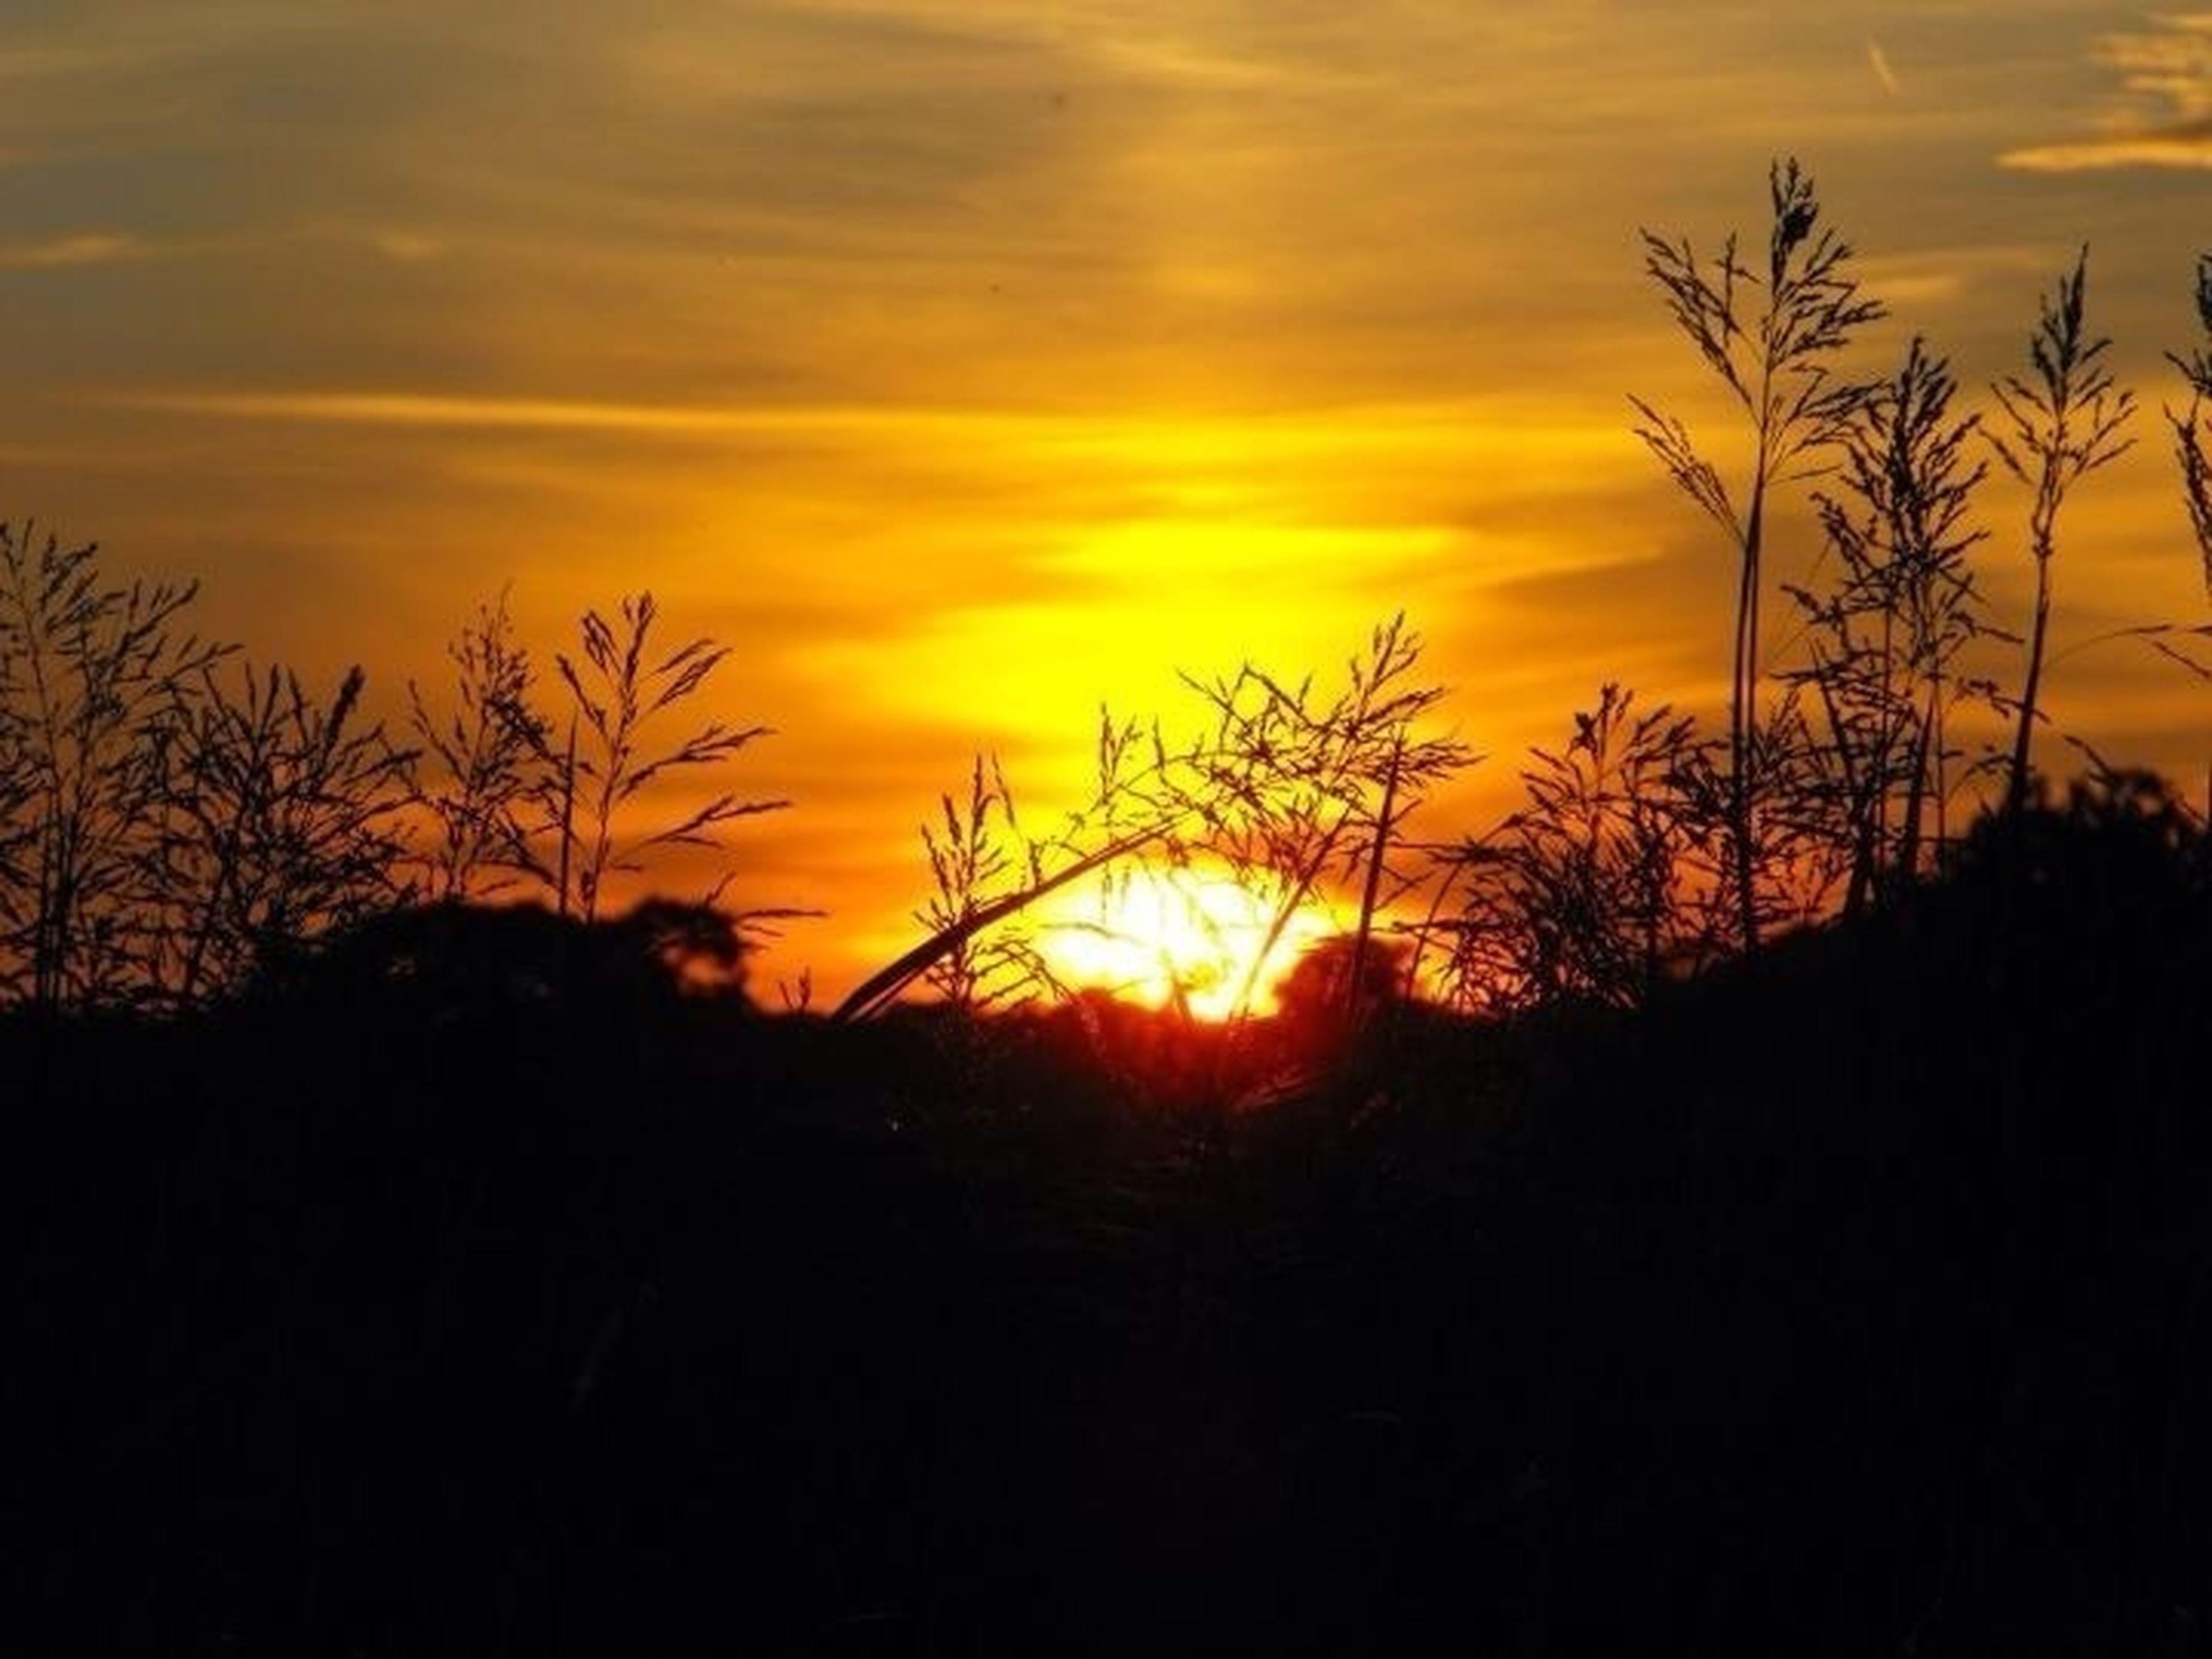 sunset, silhouette, orange color, sun, scenics, tranquil scene, beauty in nature, sky, tranquility, nature, idyllic, landscape, dramatic sky, cloud - sky, field, back lit, dark, moody sky, cloud, outdoors